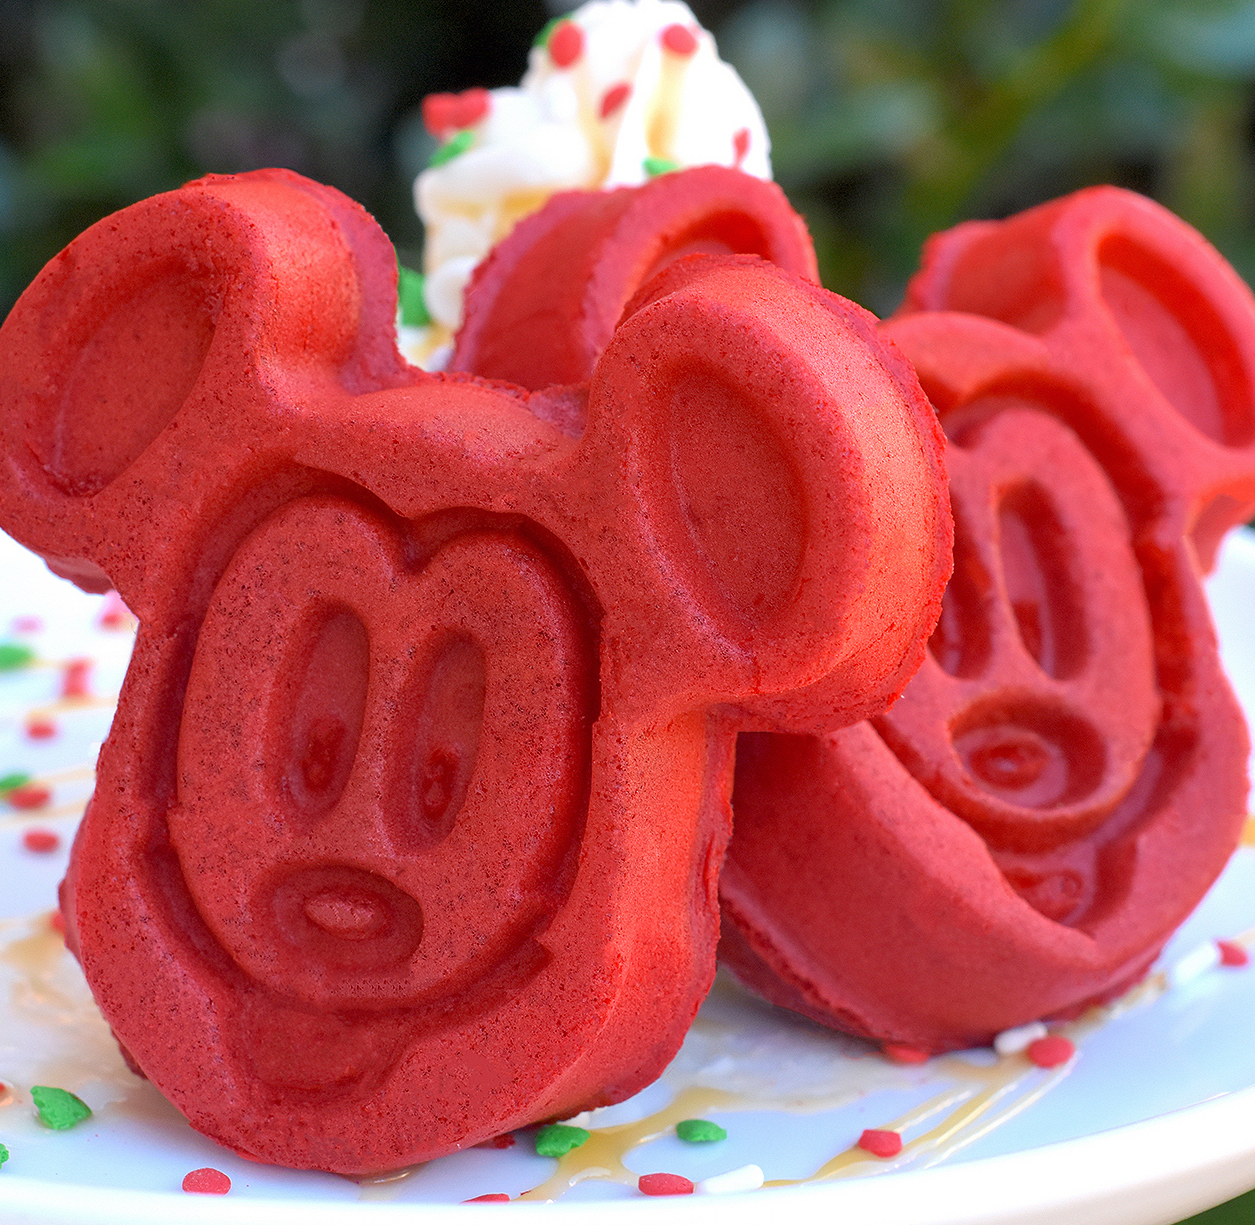 Walt Disney World food options